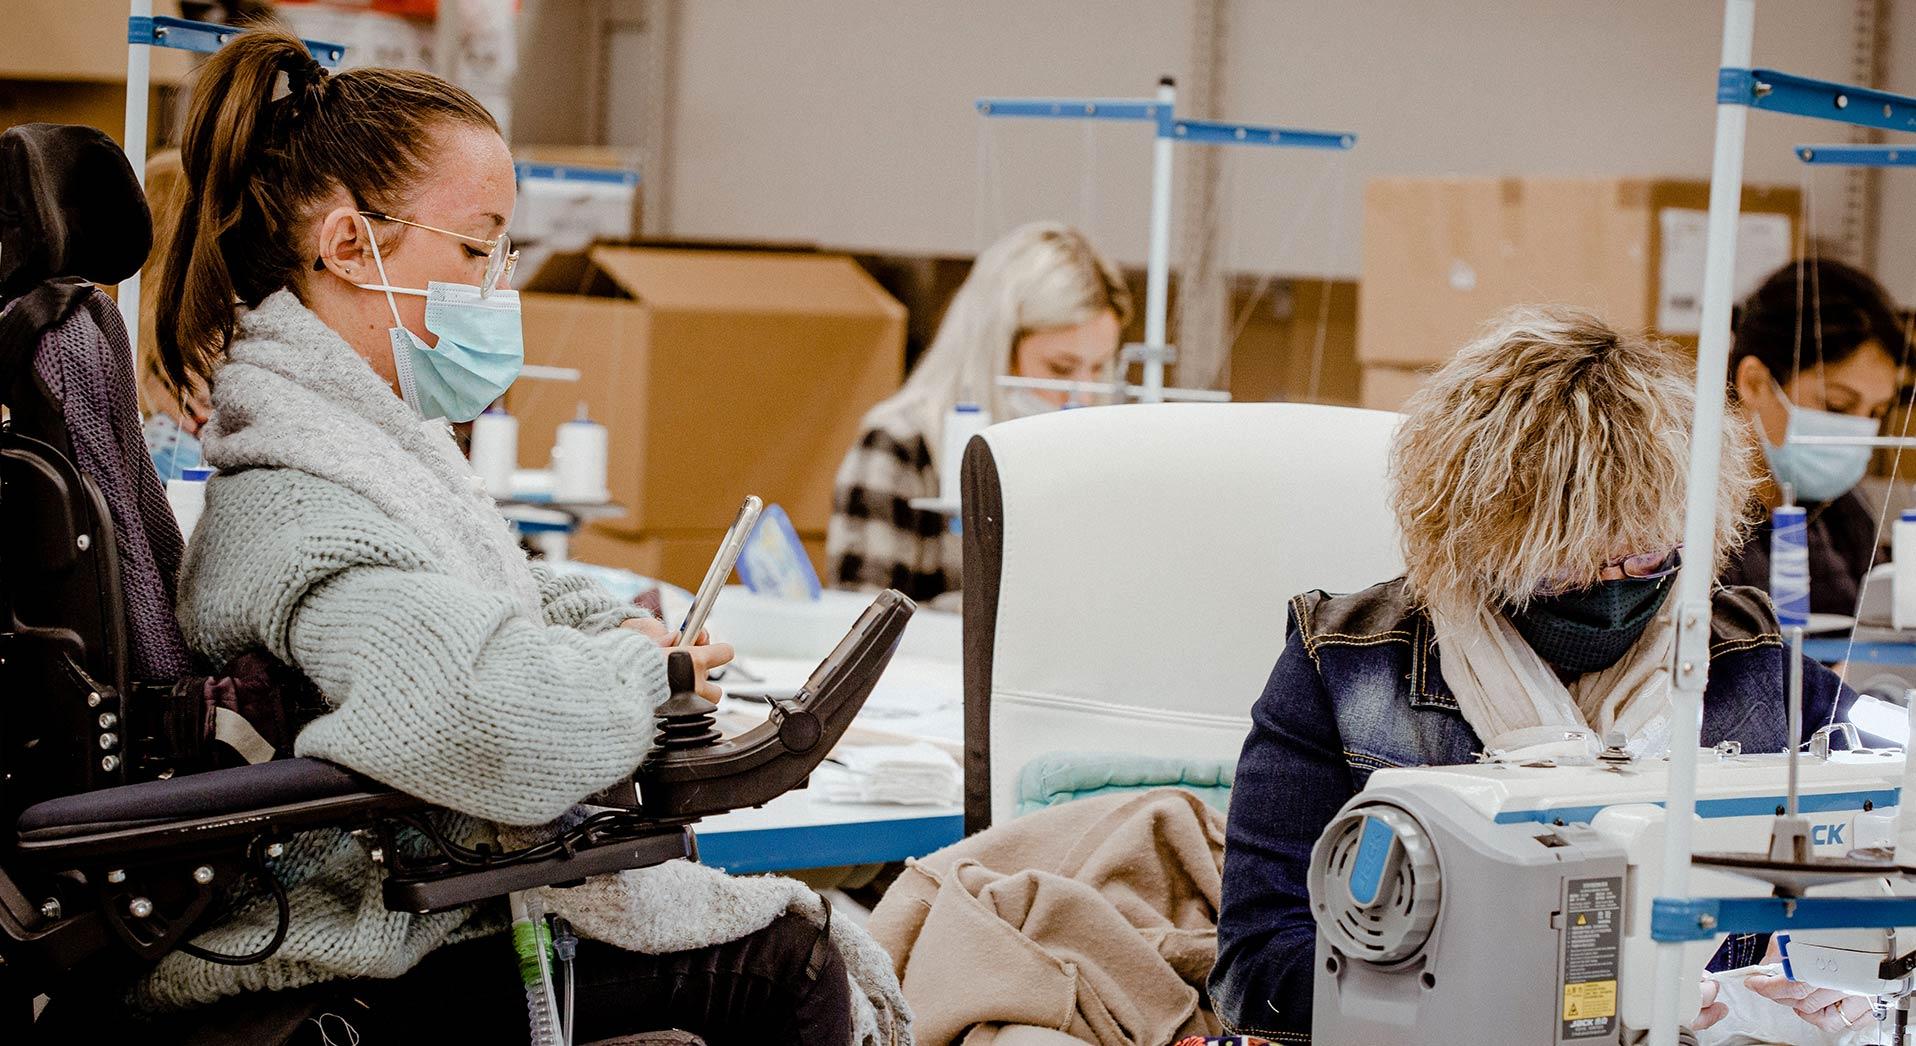 nuntisunya_fms_entreprise_engagee_chanvre_textile_interview_clara